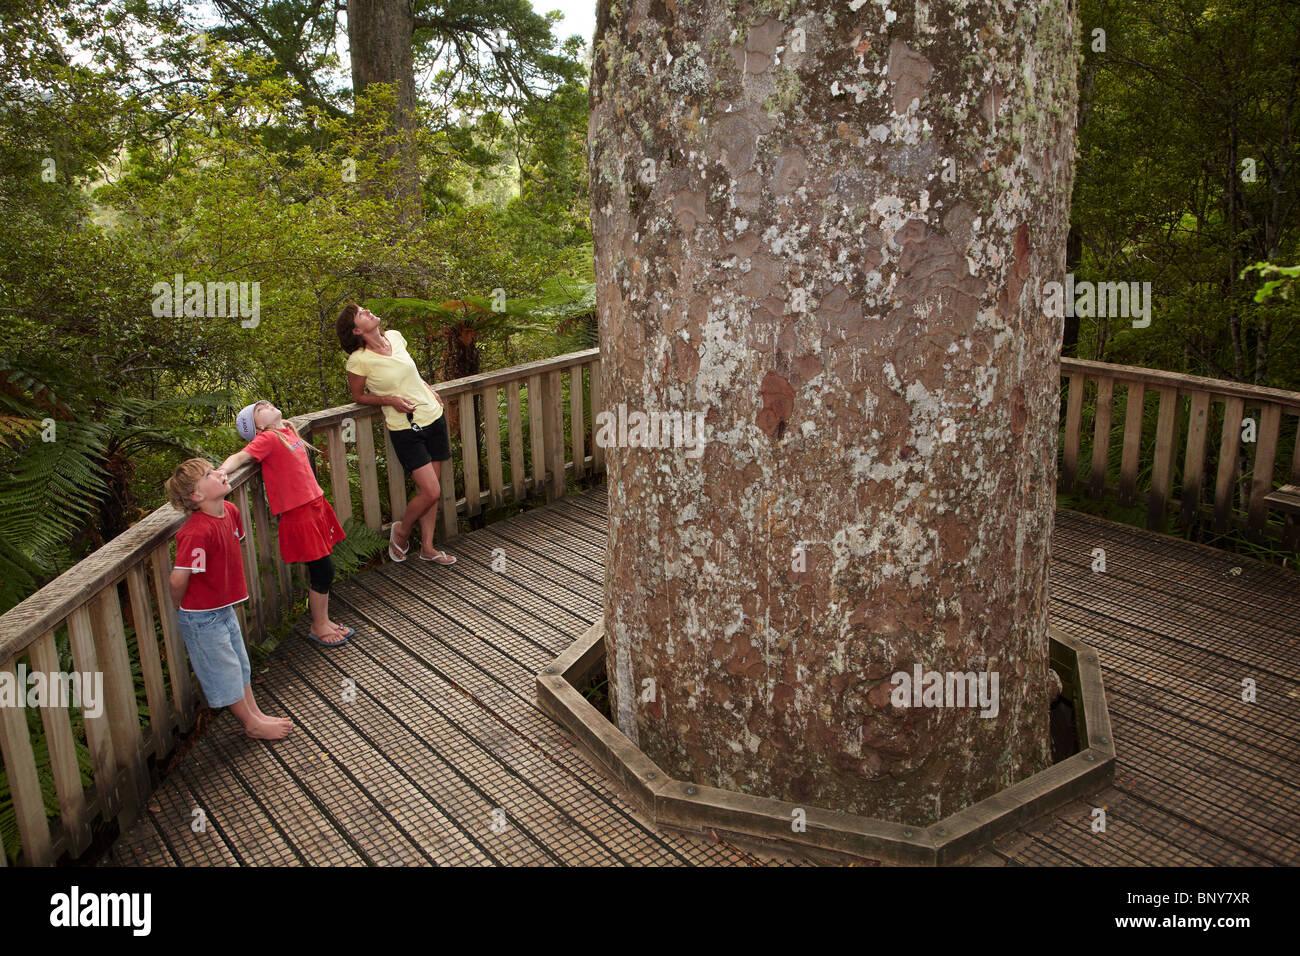 Family Visiting Giant Kauri Tree, Waiau Kauri Grove, 309 Road, Coromandel Peninsula, North Island, New Zealand - Stock Image